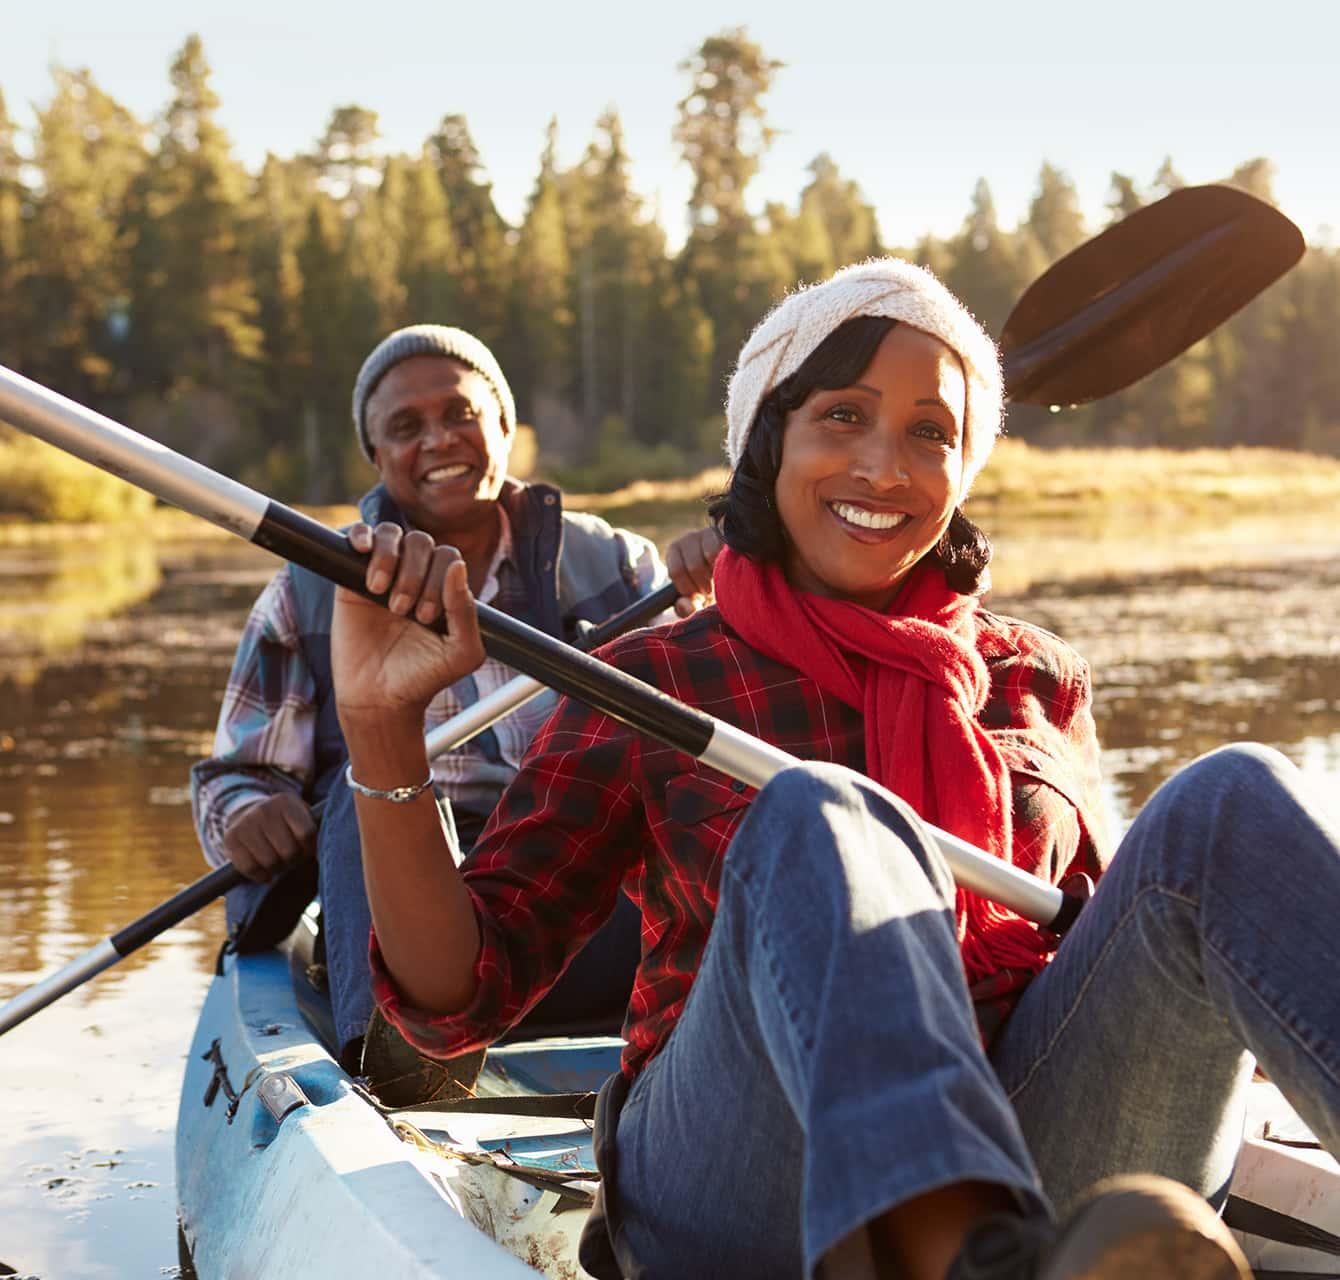 Couple kayaking - Top Activity near Boone, NC